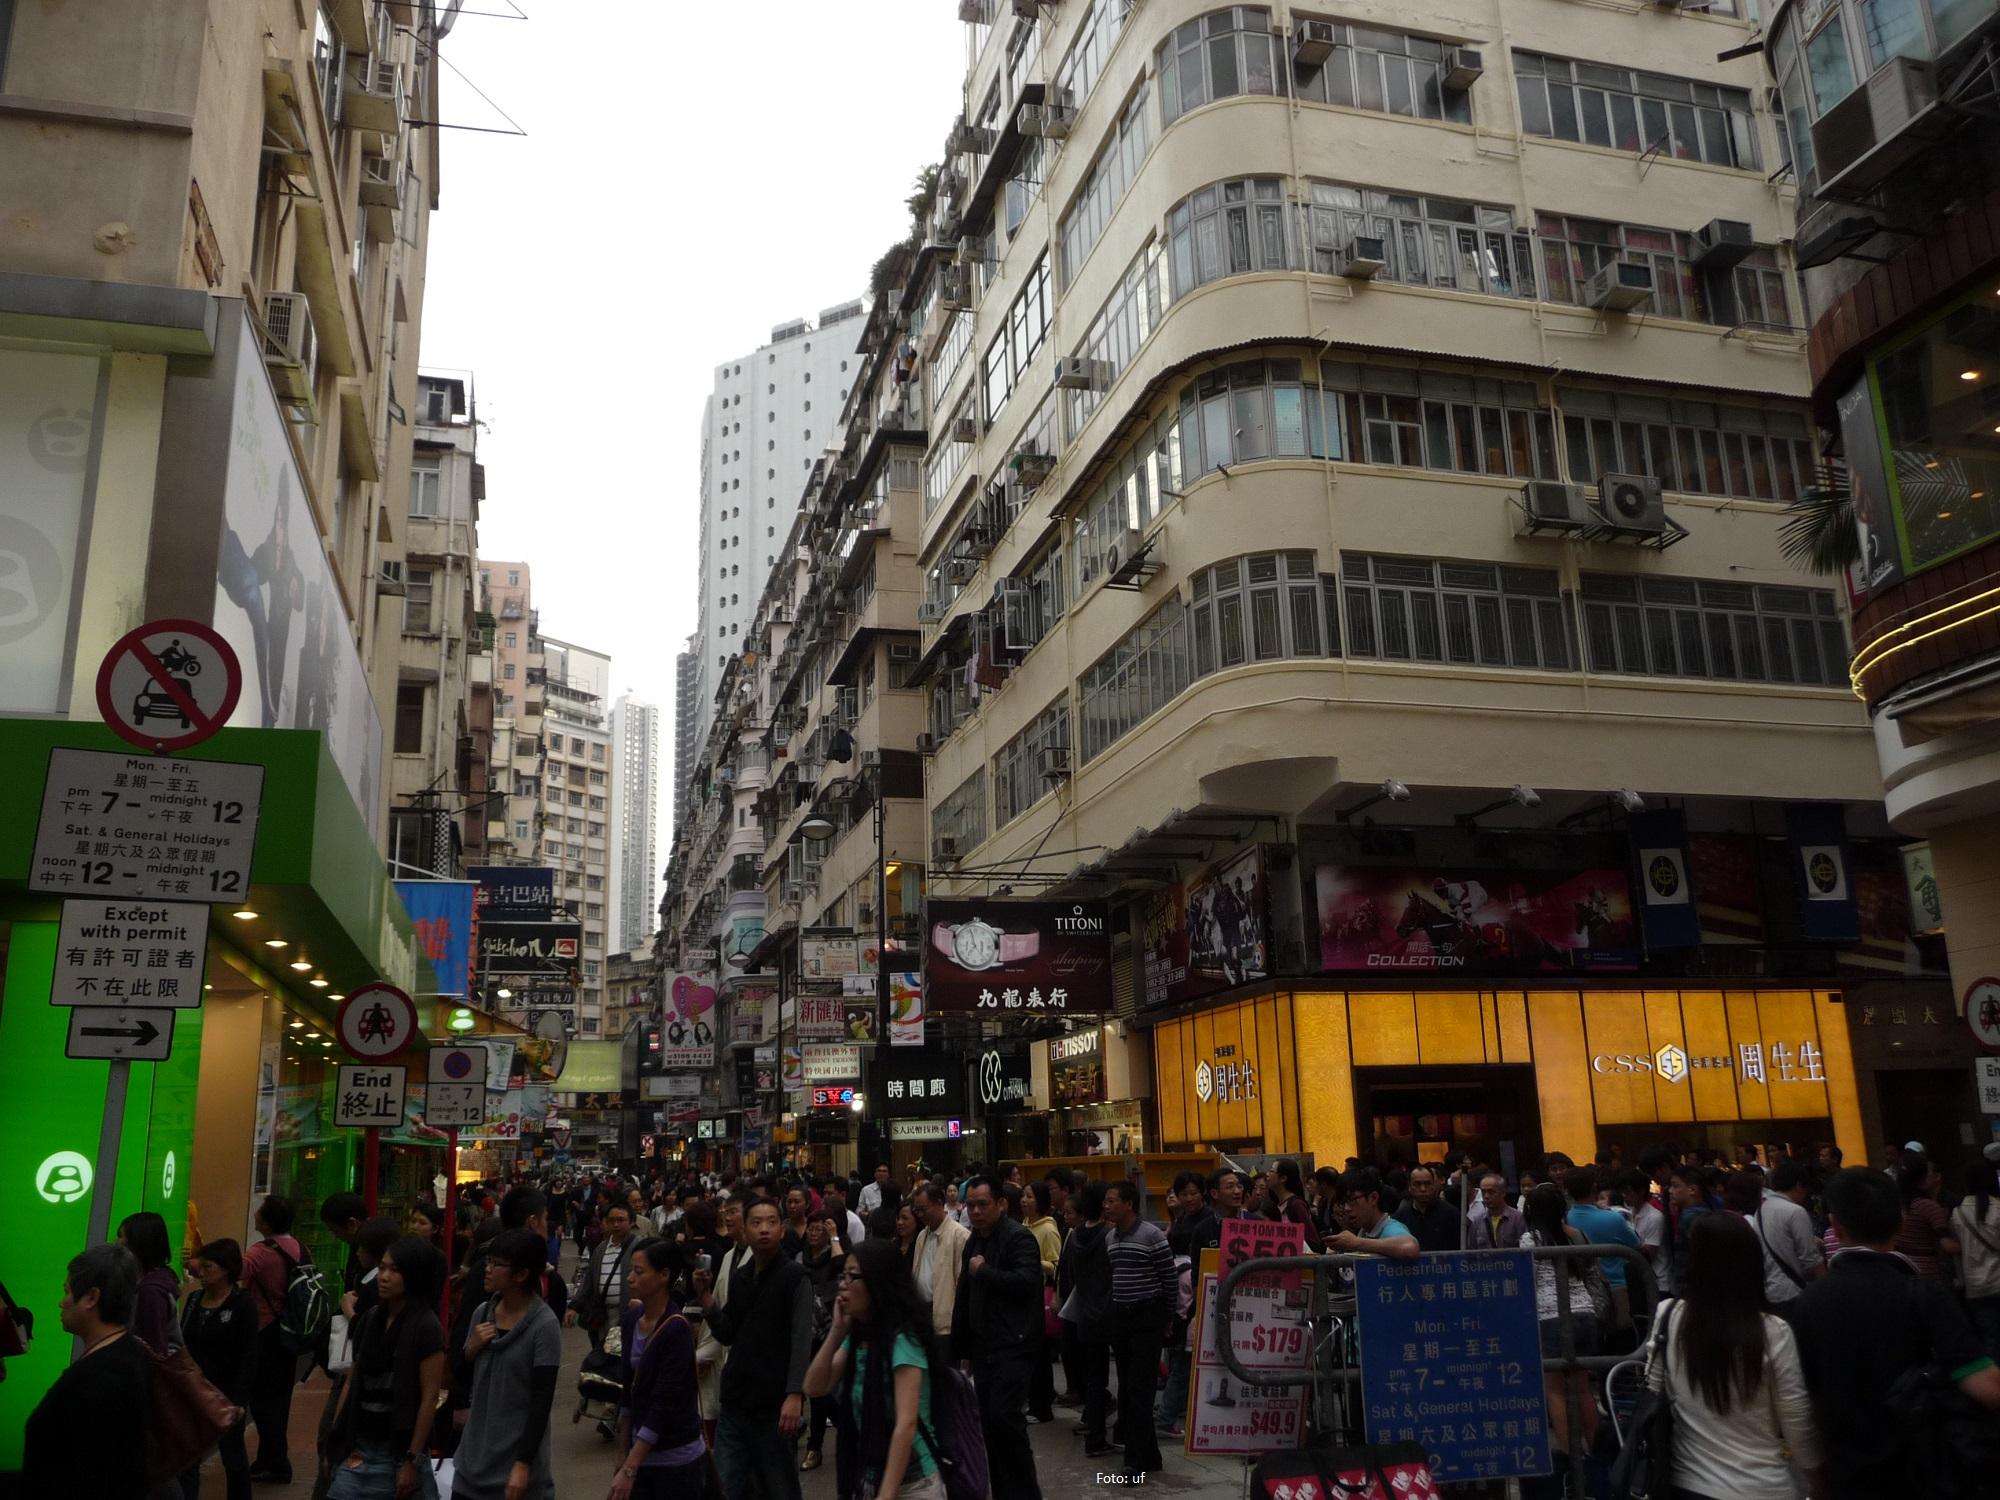 Sonntags in Hong Kongs Straßen - Shopping Day!